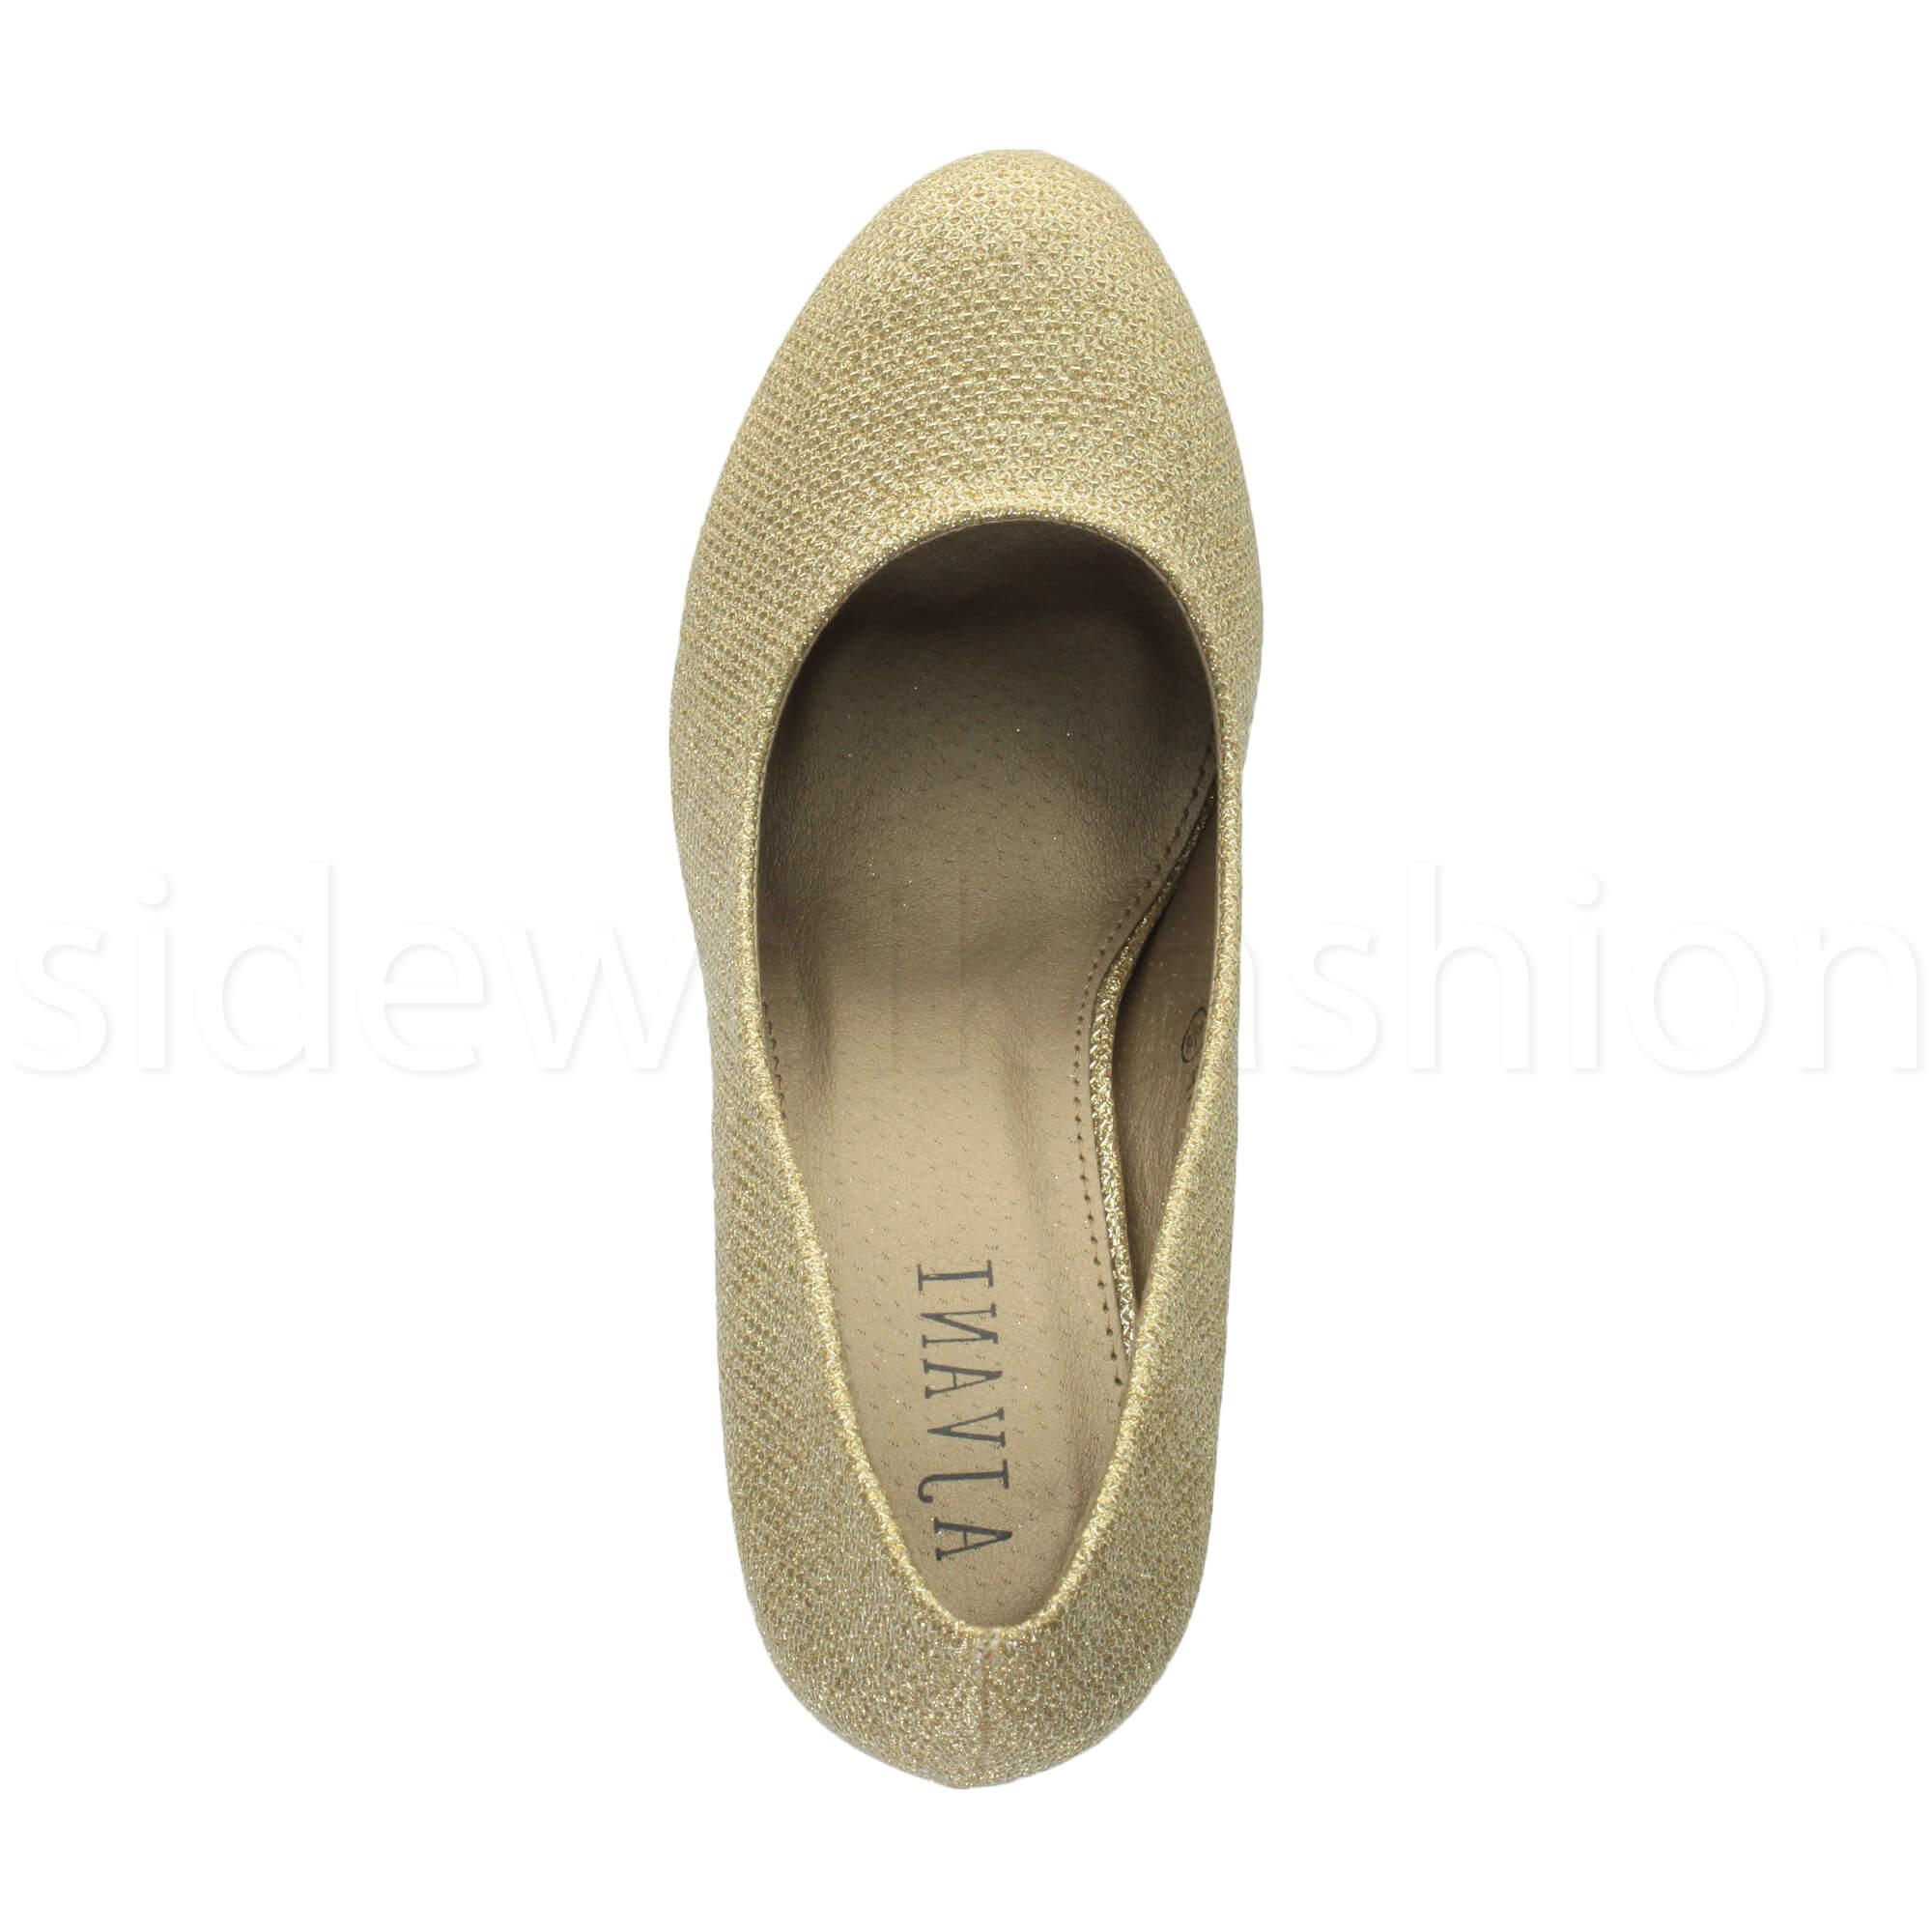 Womens-ladies-high-mid-heel-platform-wedding-evening-bridesmaid-court-shoes-size thumbnail 70